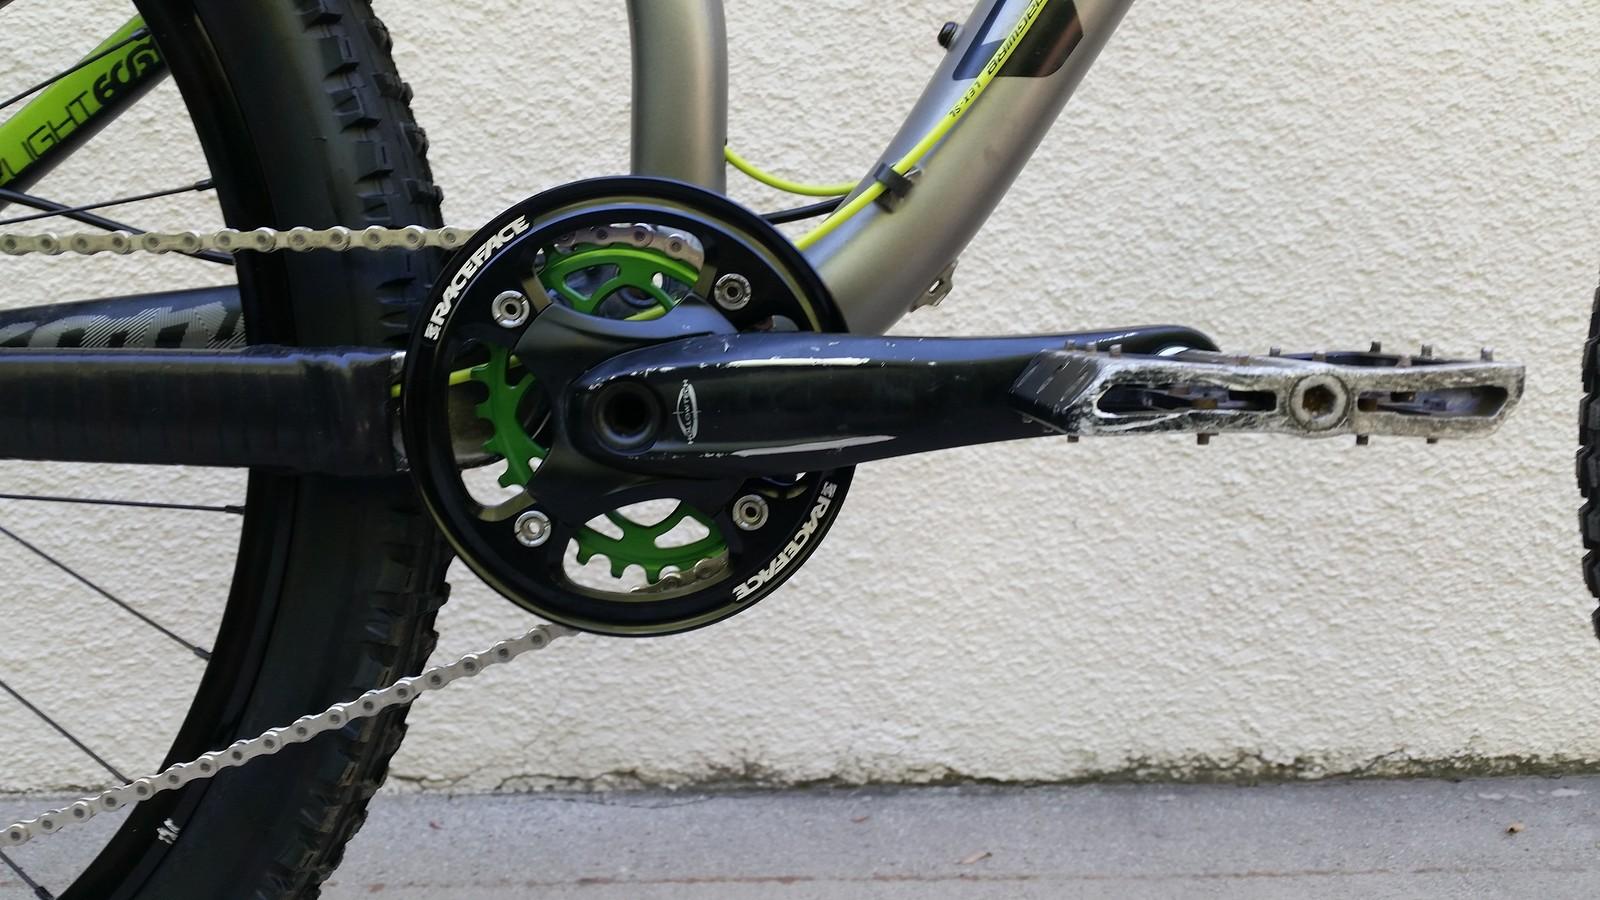 edbbdf59574 Upgraded Kona Precept DL - ThereIsNoLine's Bike Check - Vital MTB